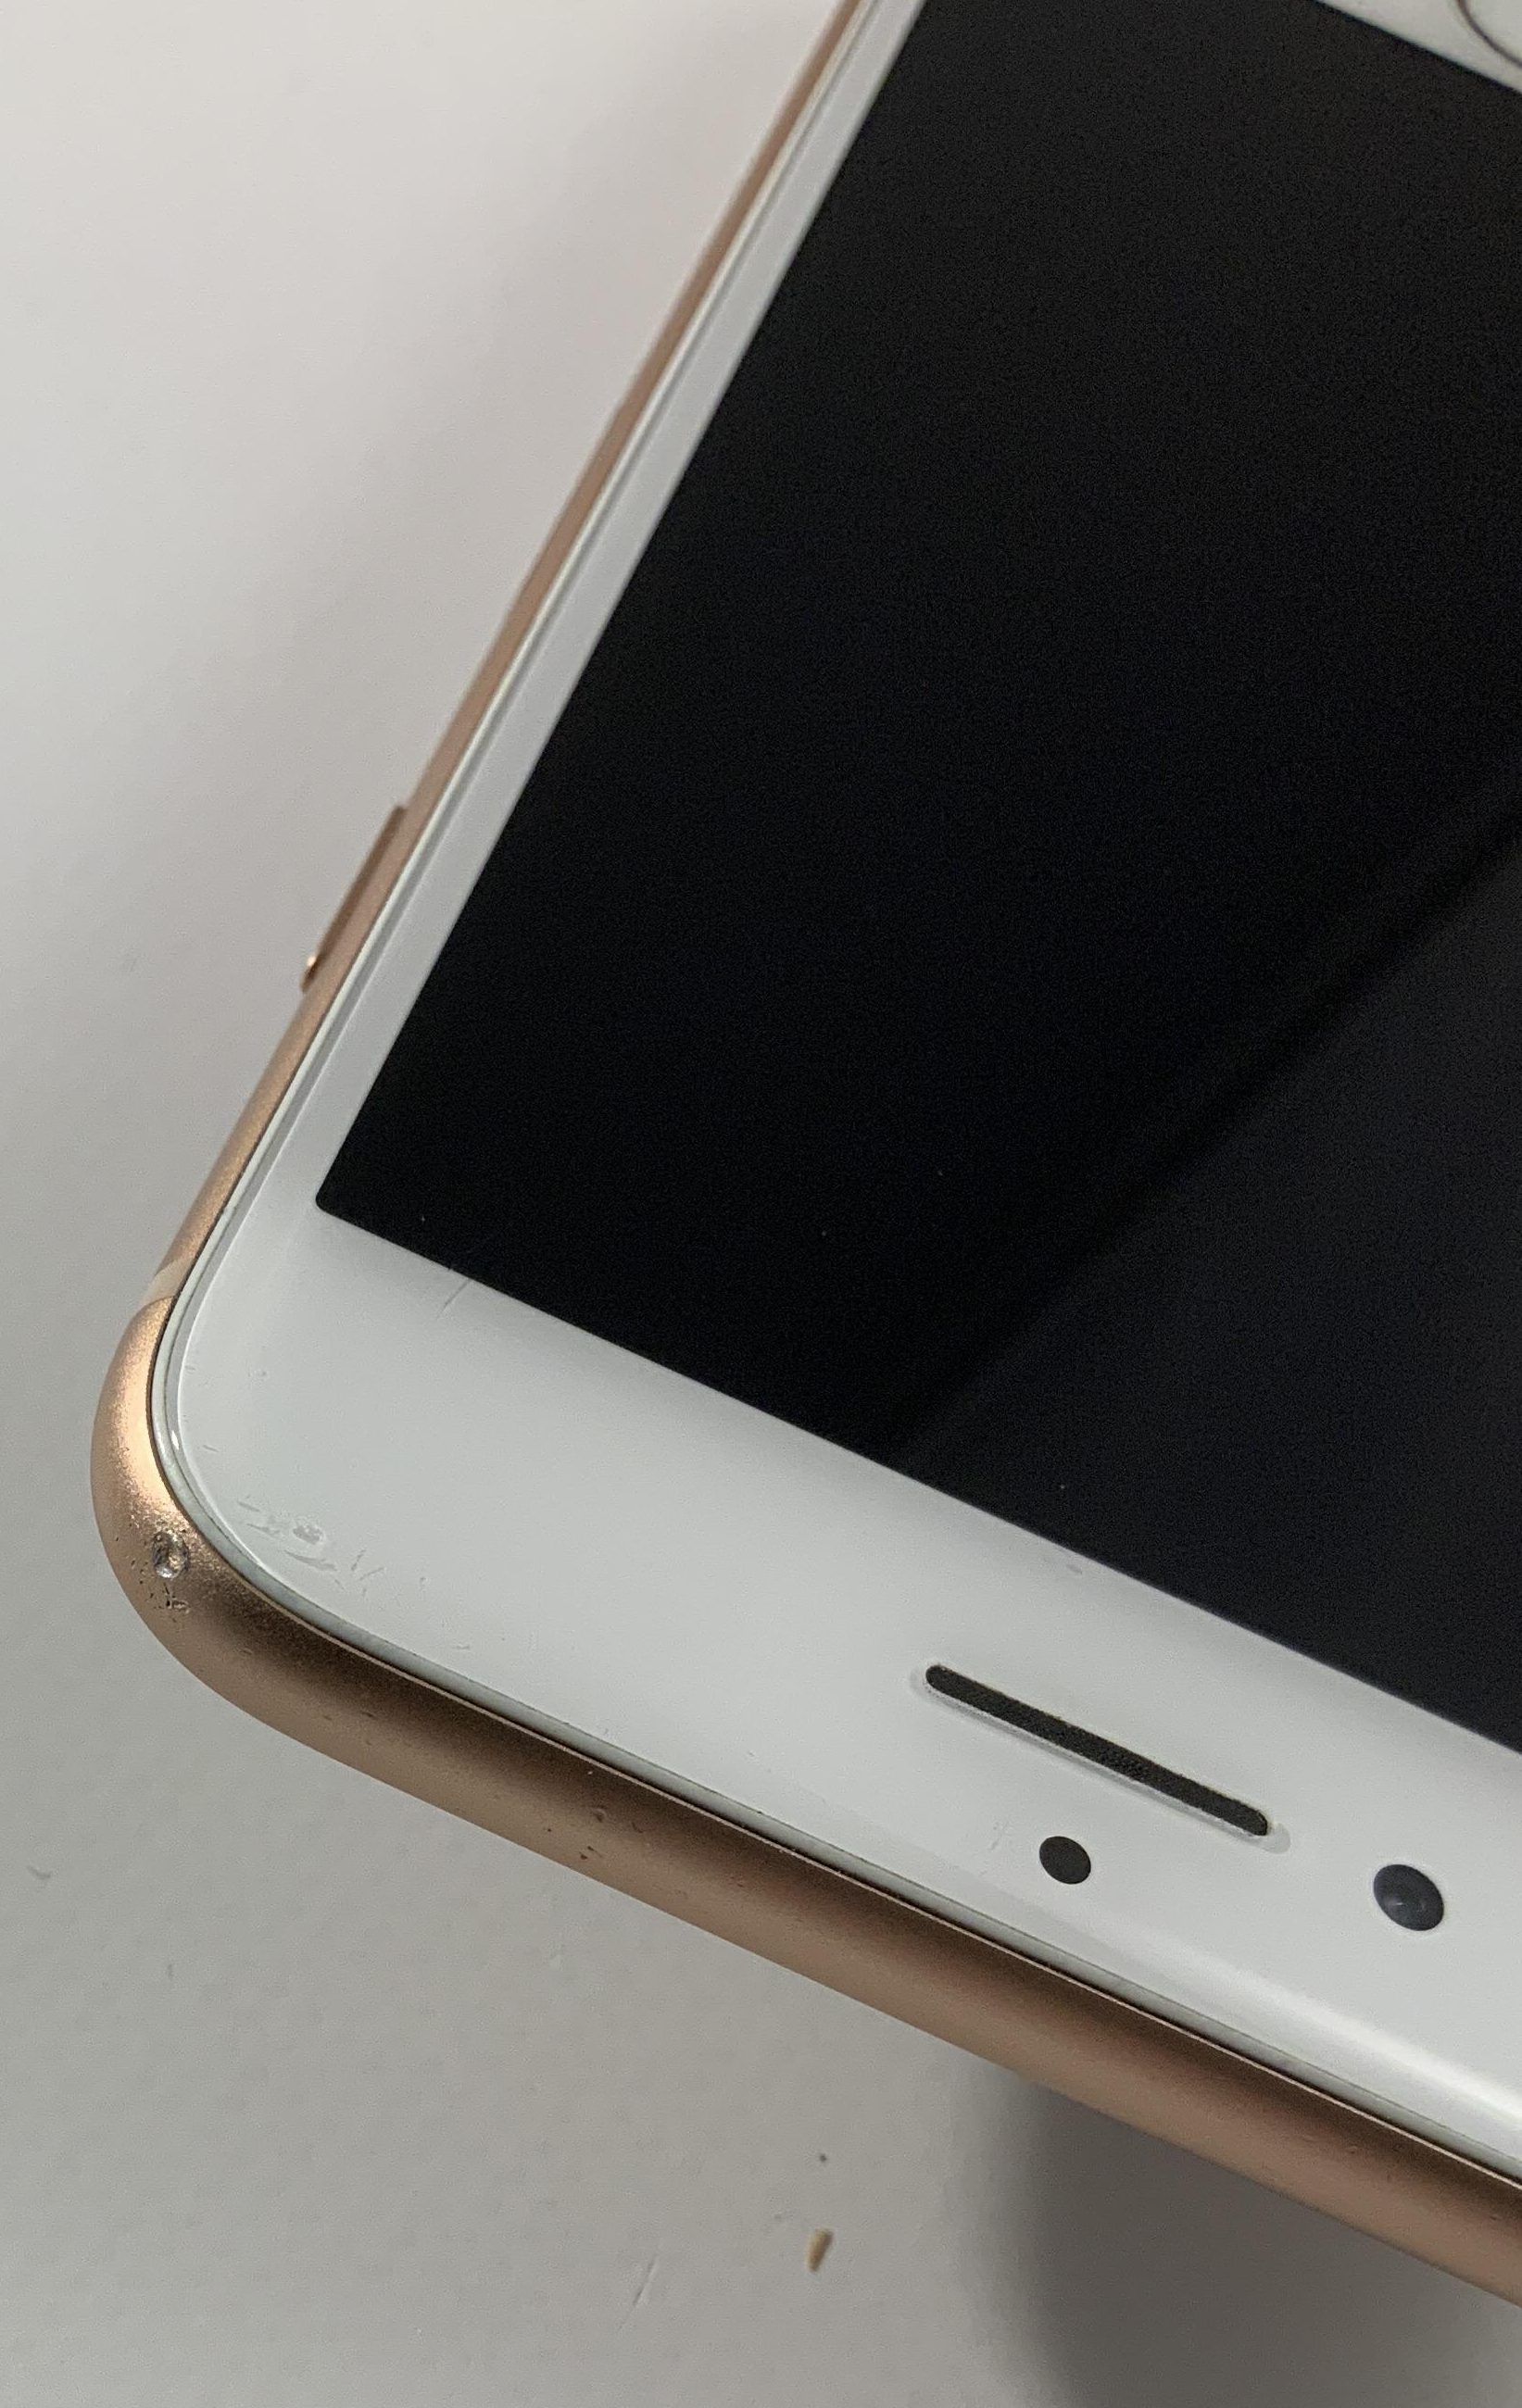 iPhone 8 256GB, 256GB, Gold, image 3